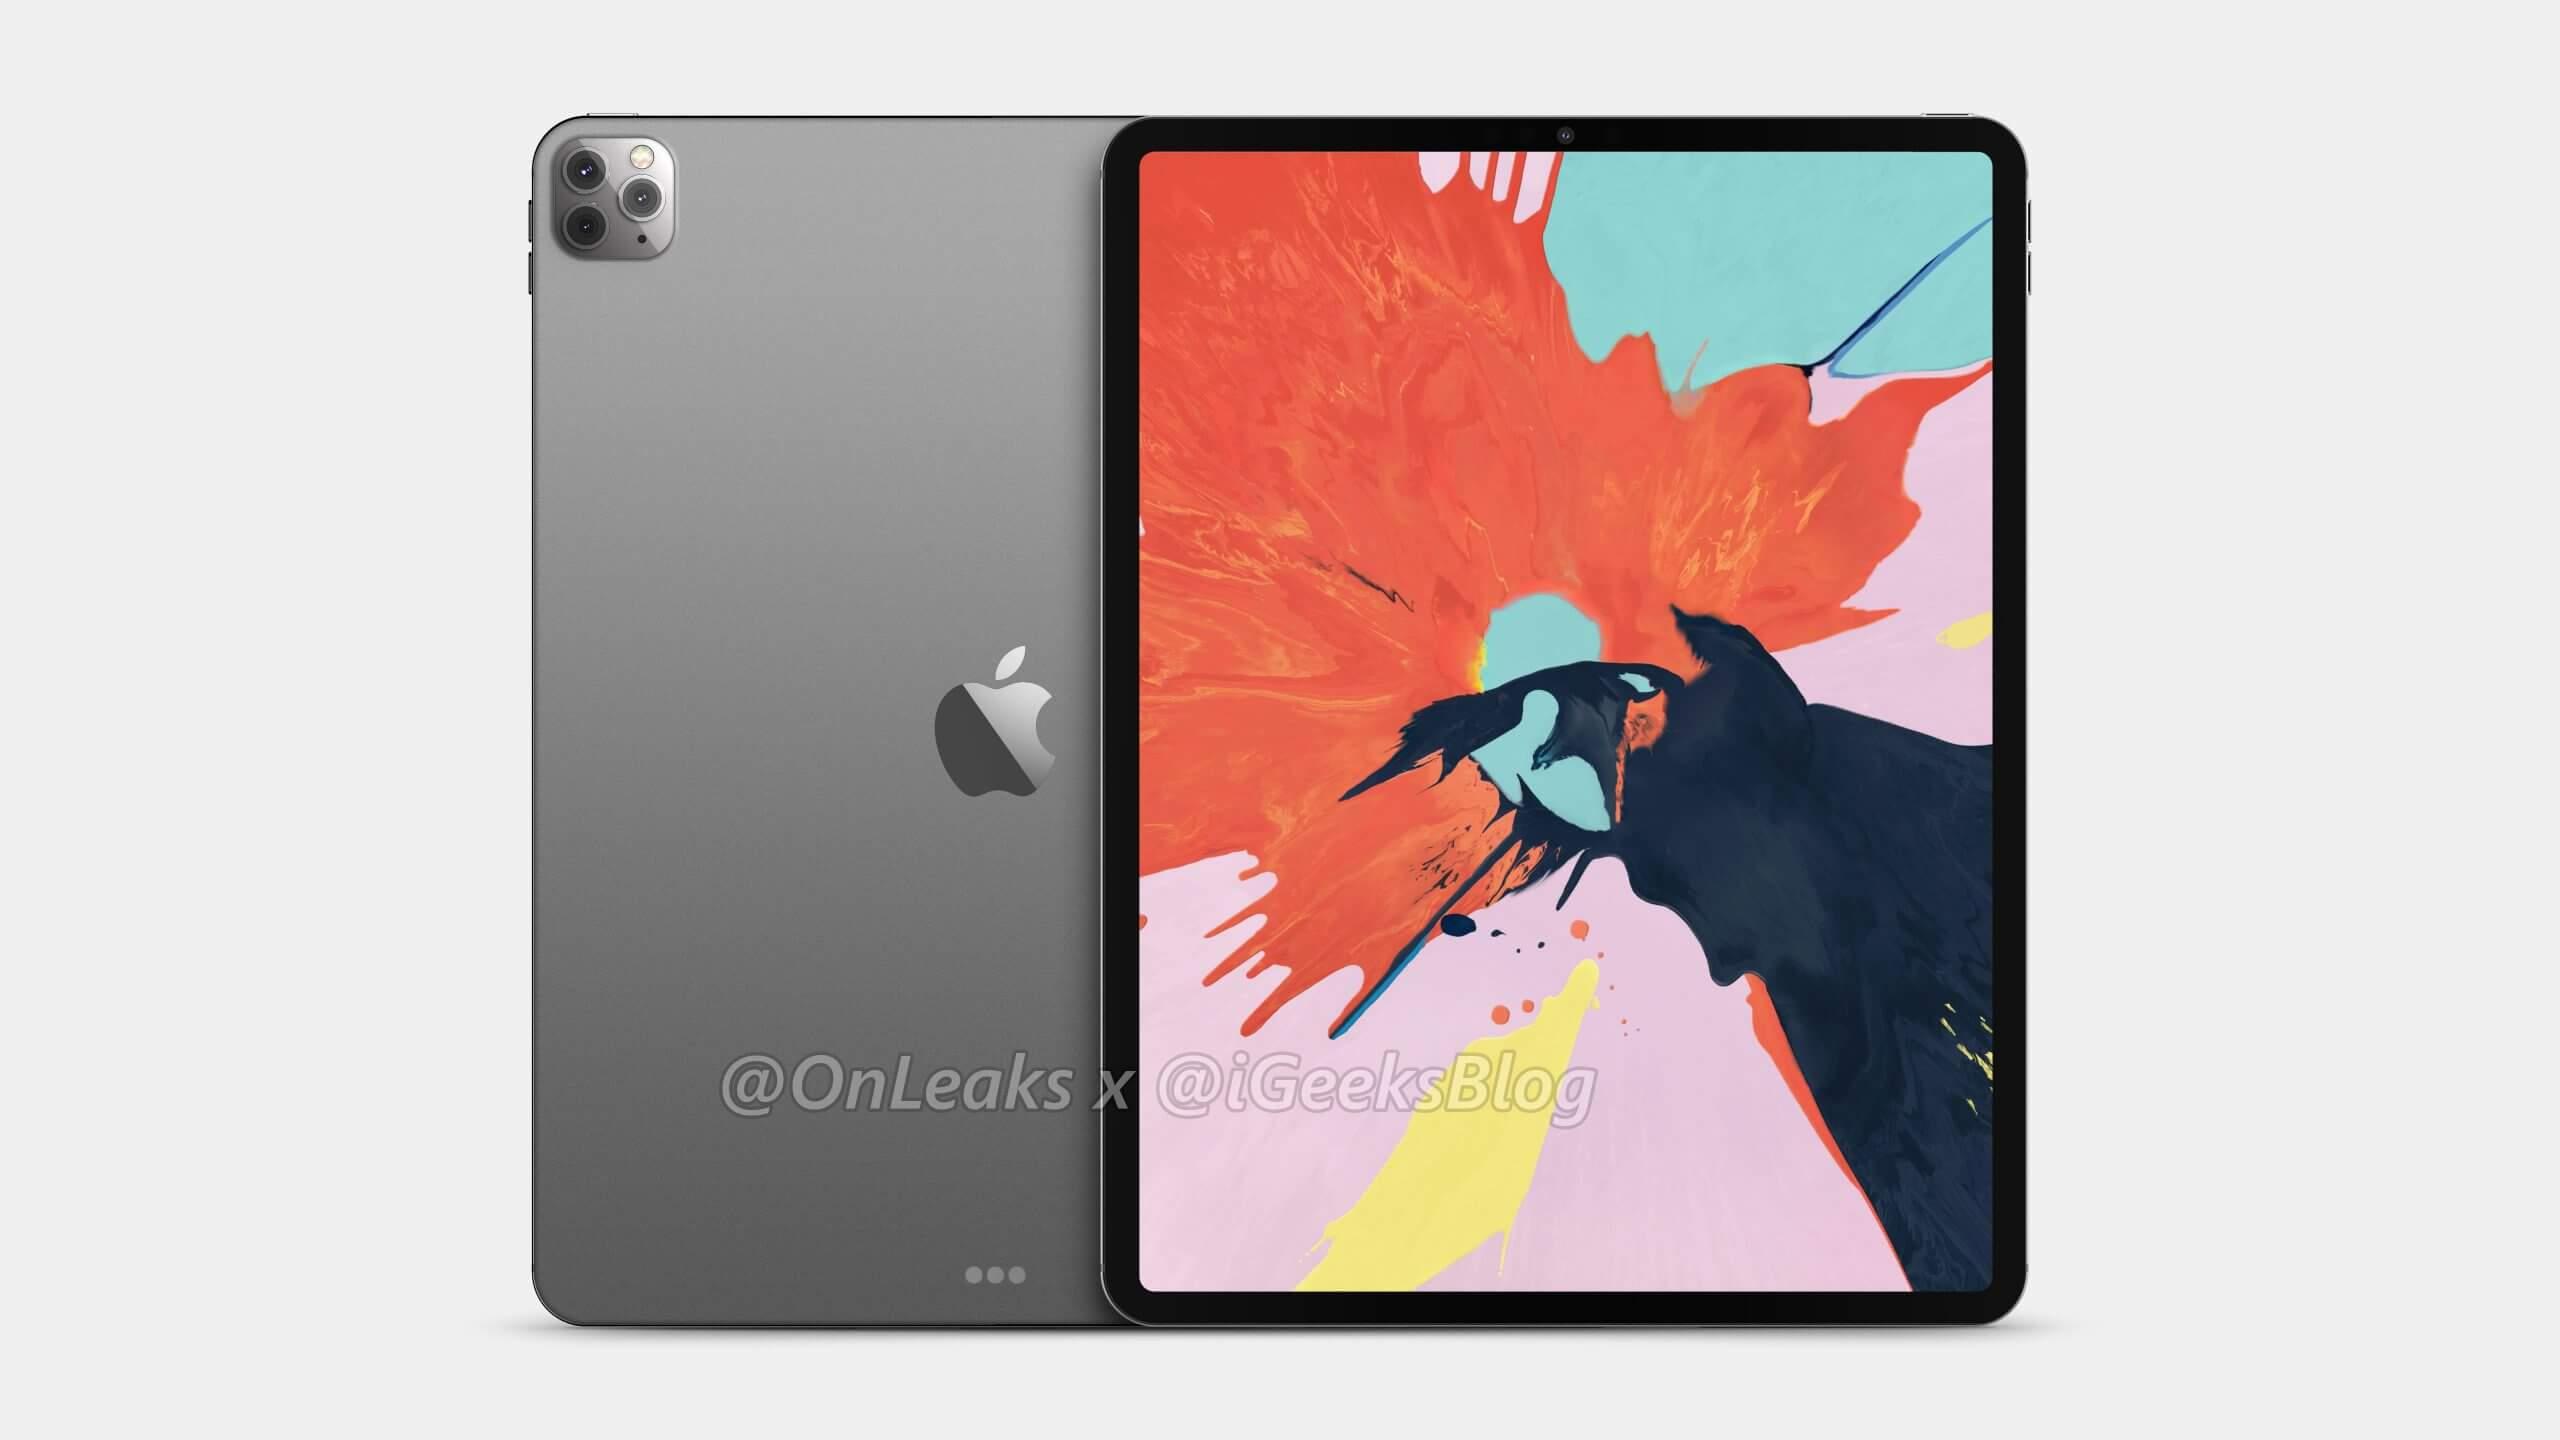 2020 12.9-inch iPad Pro with Triple Camera